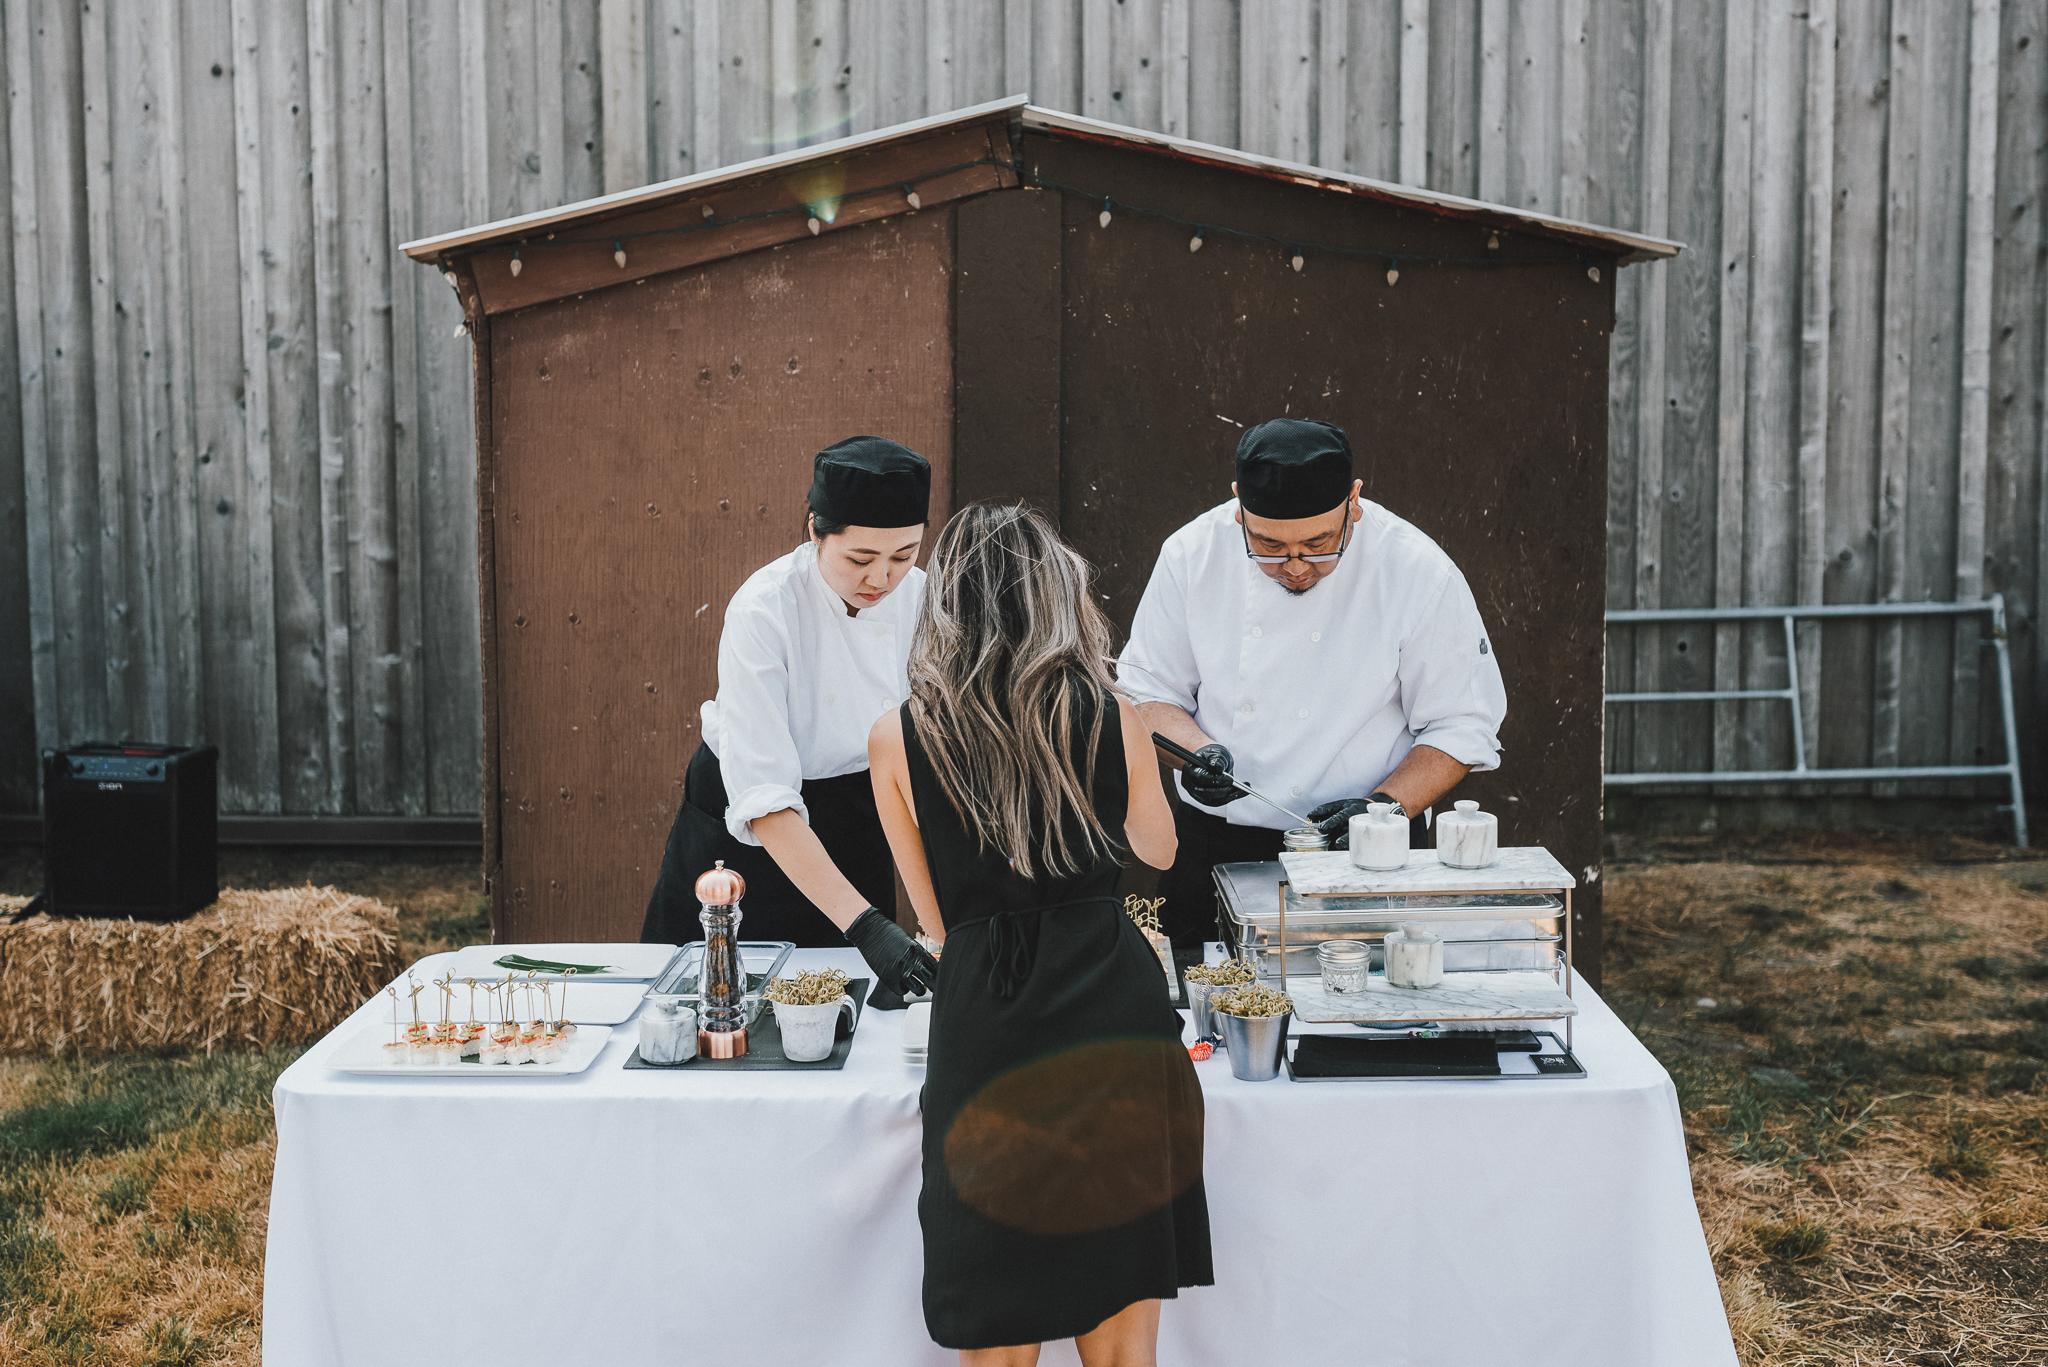 wellbrookwinerywedding-carrieaugustine-thekoebels-42.jpg